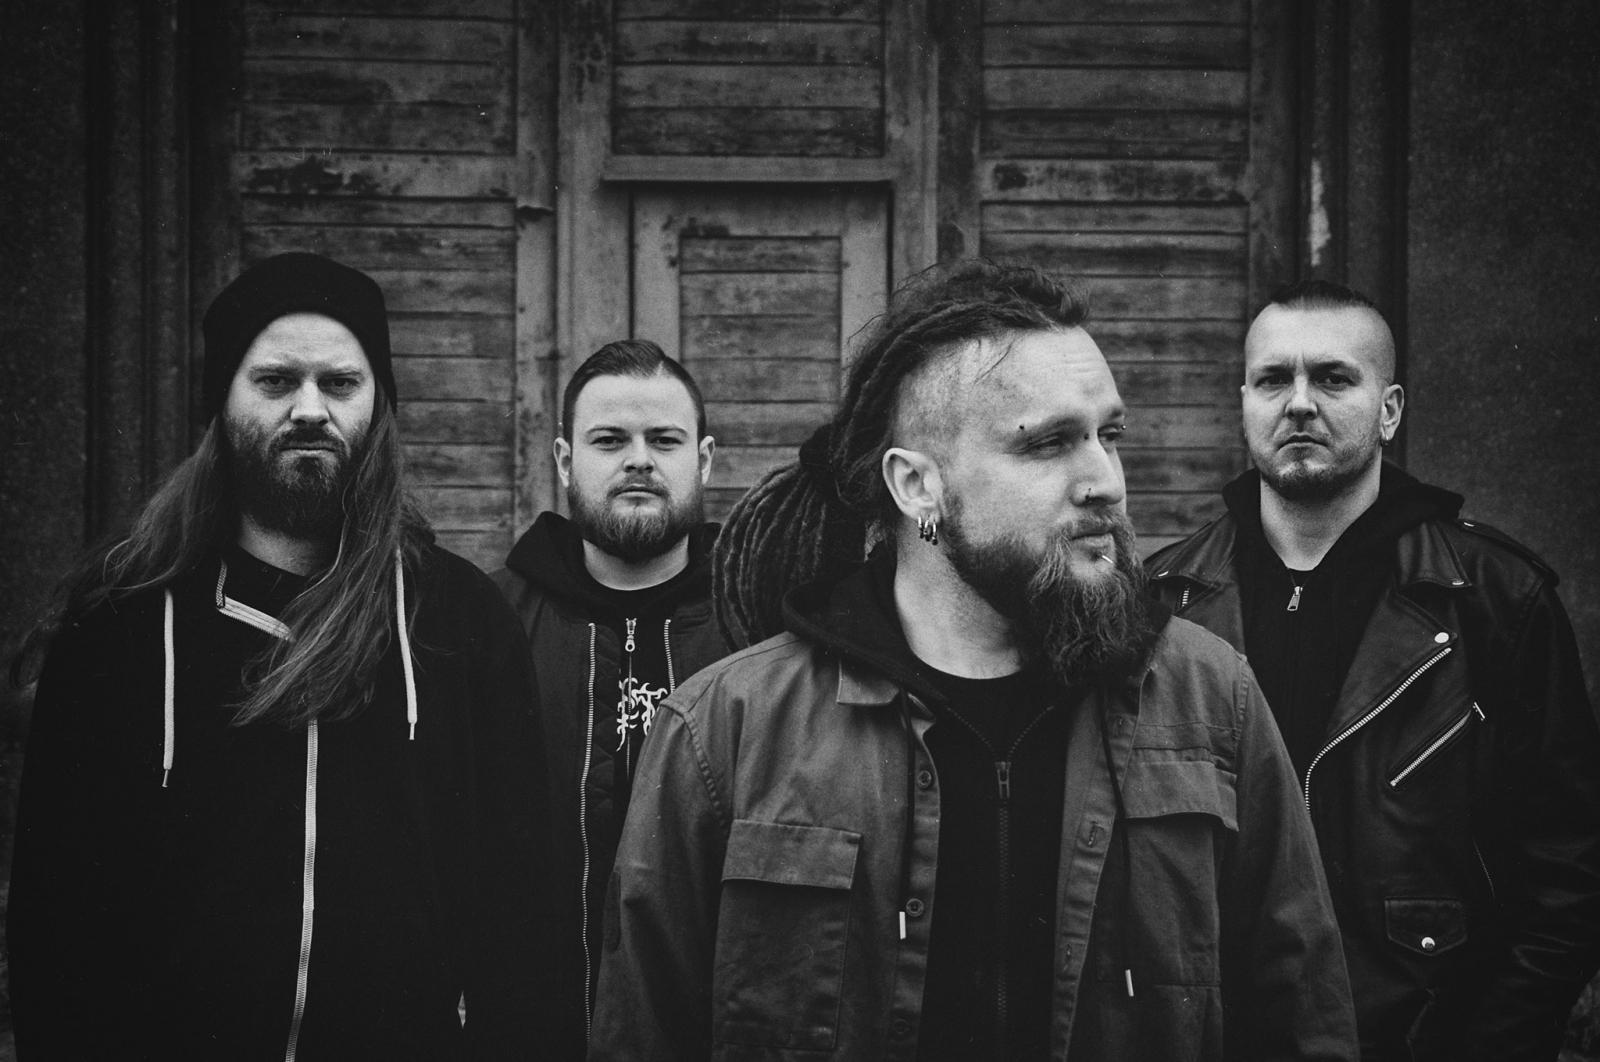 metal band Decapitated